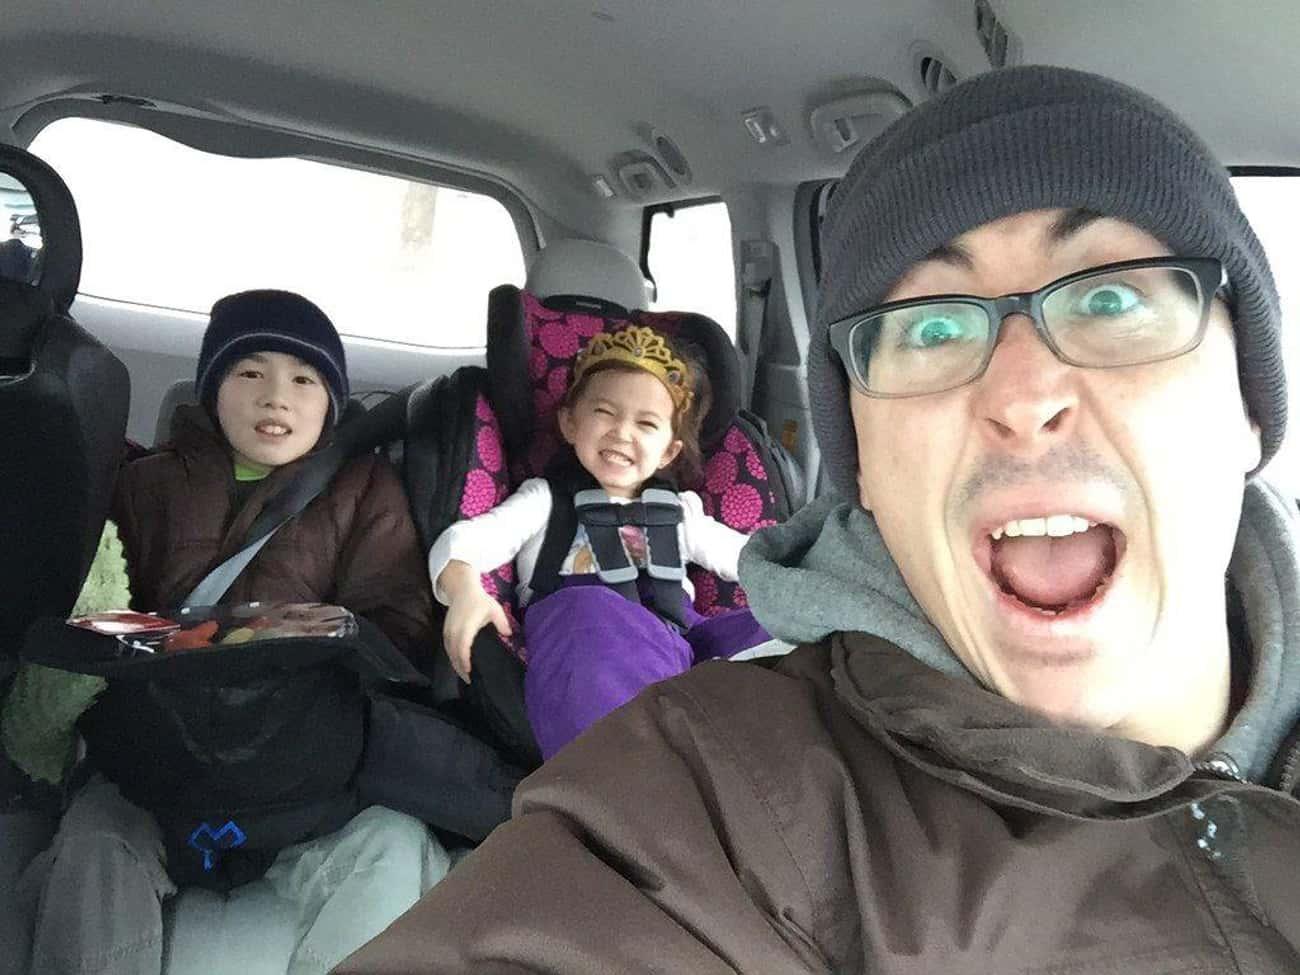 The Car-selfie